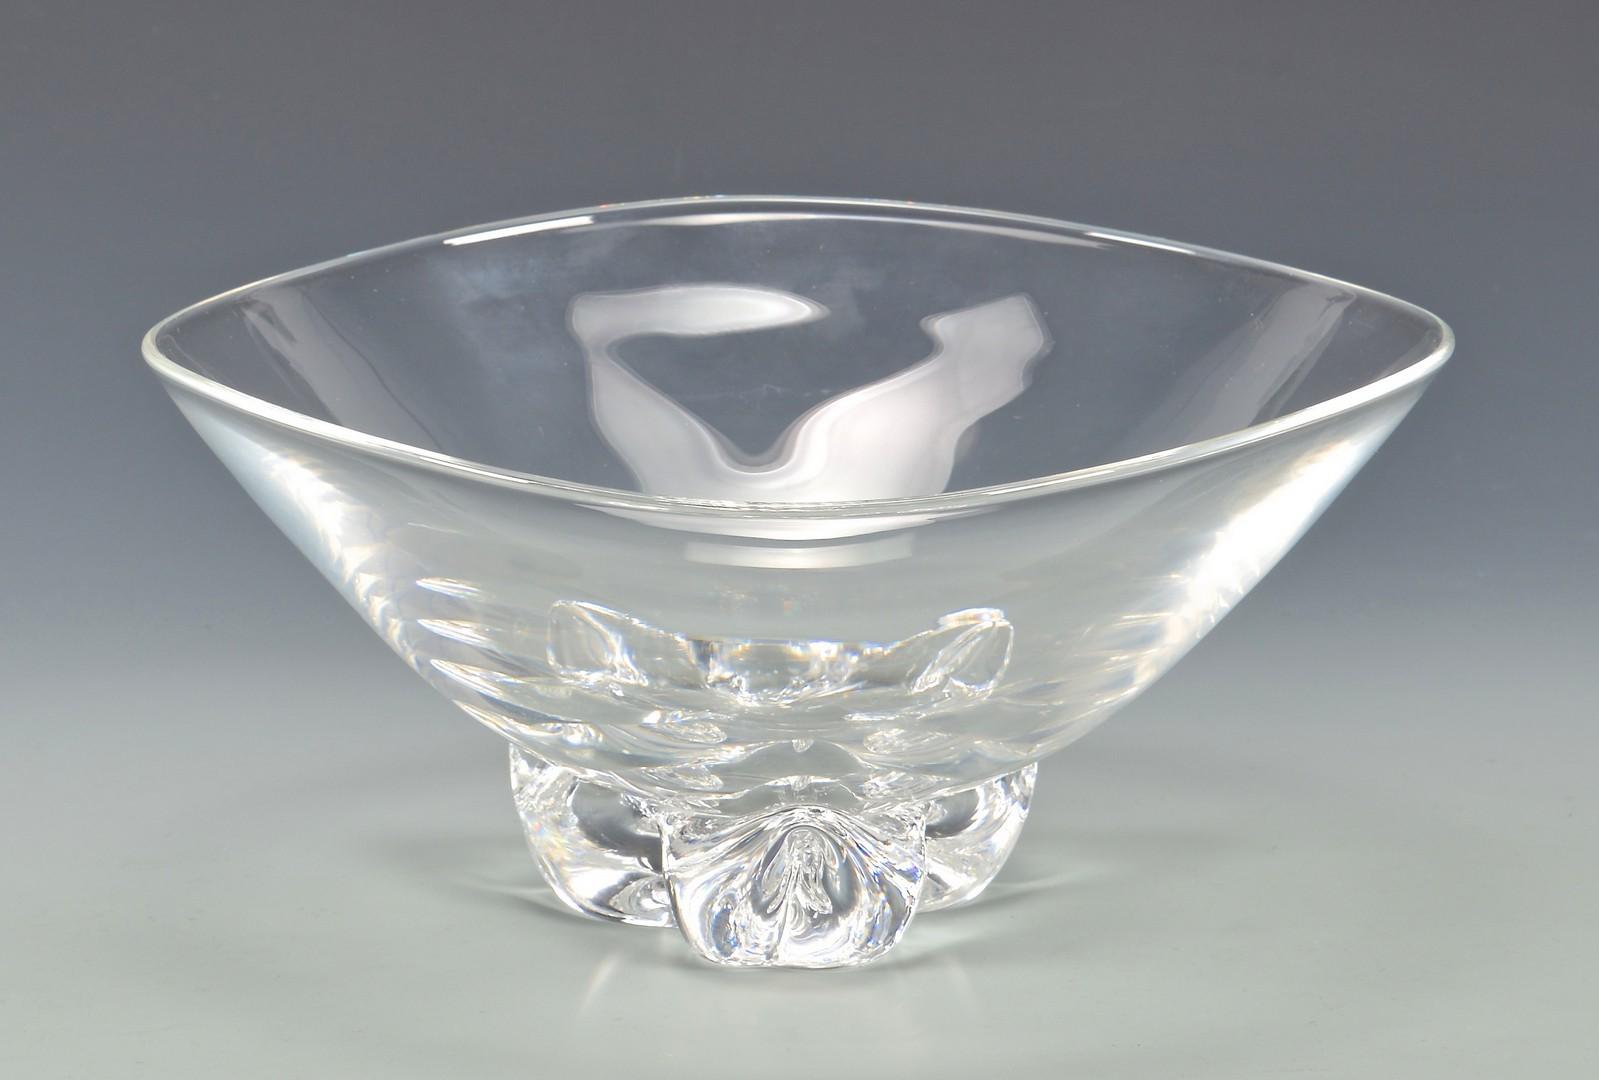 Lot 469: Steuben Trillium Bowl, Candlesticks